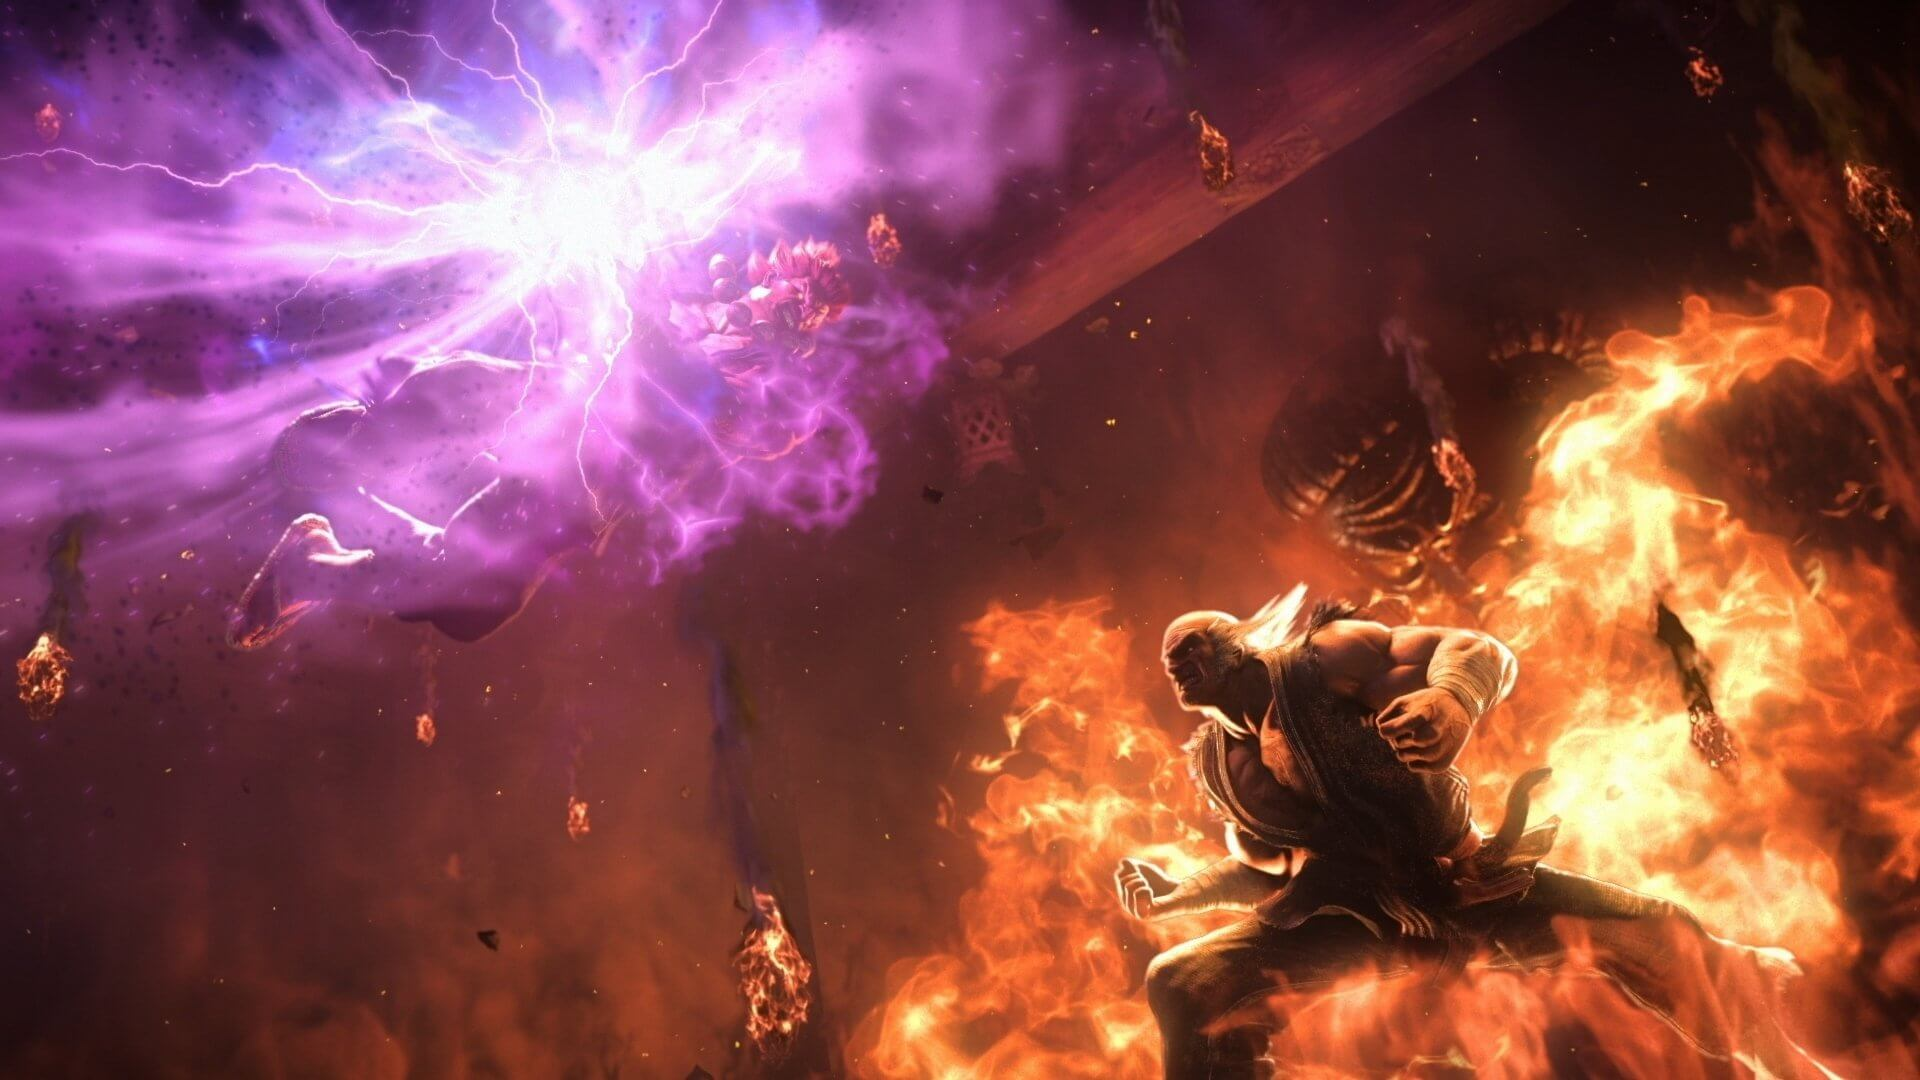 Should Devs Add Cross-platform Play to Tekken 7?